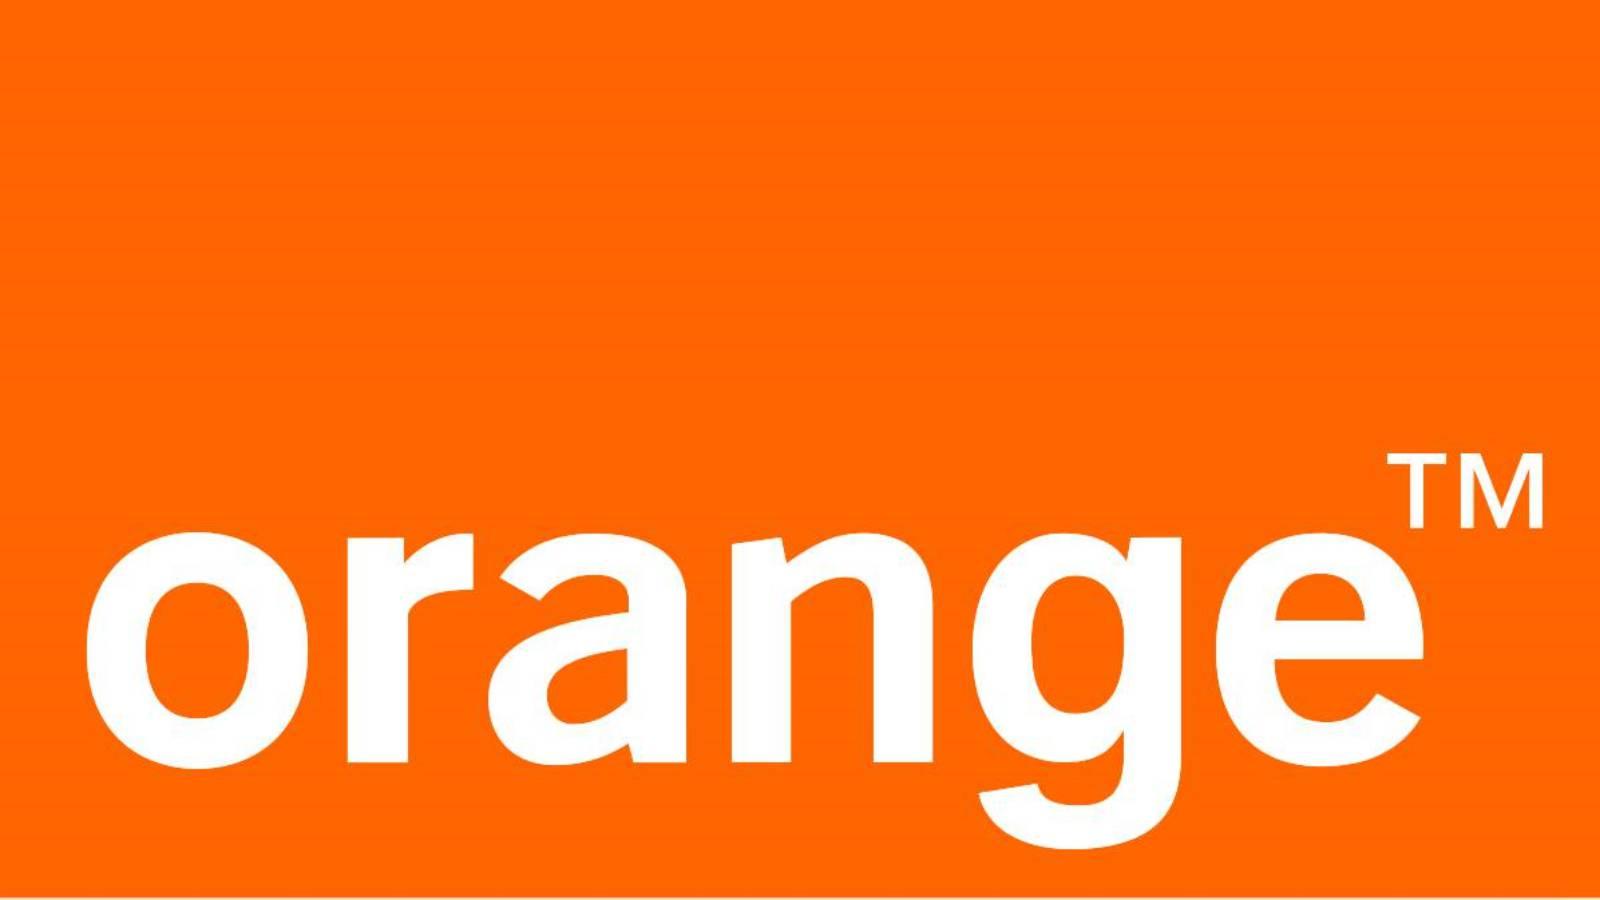 Orange autostrada